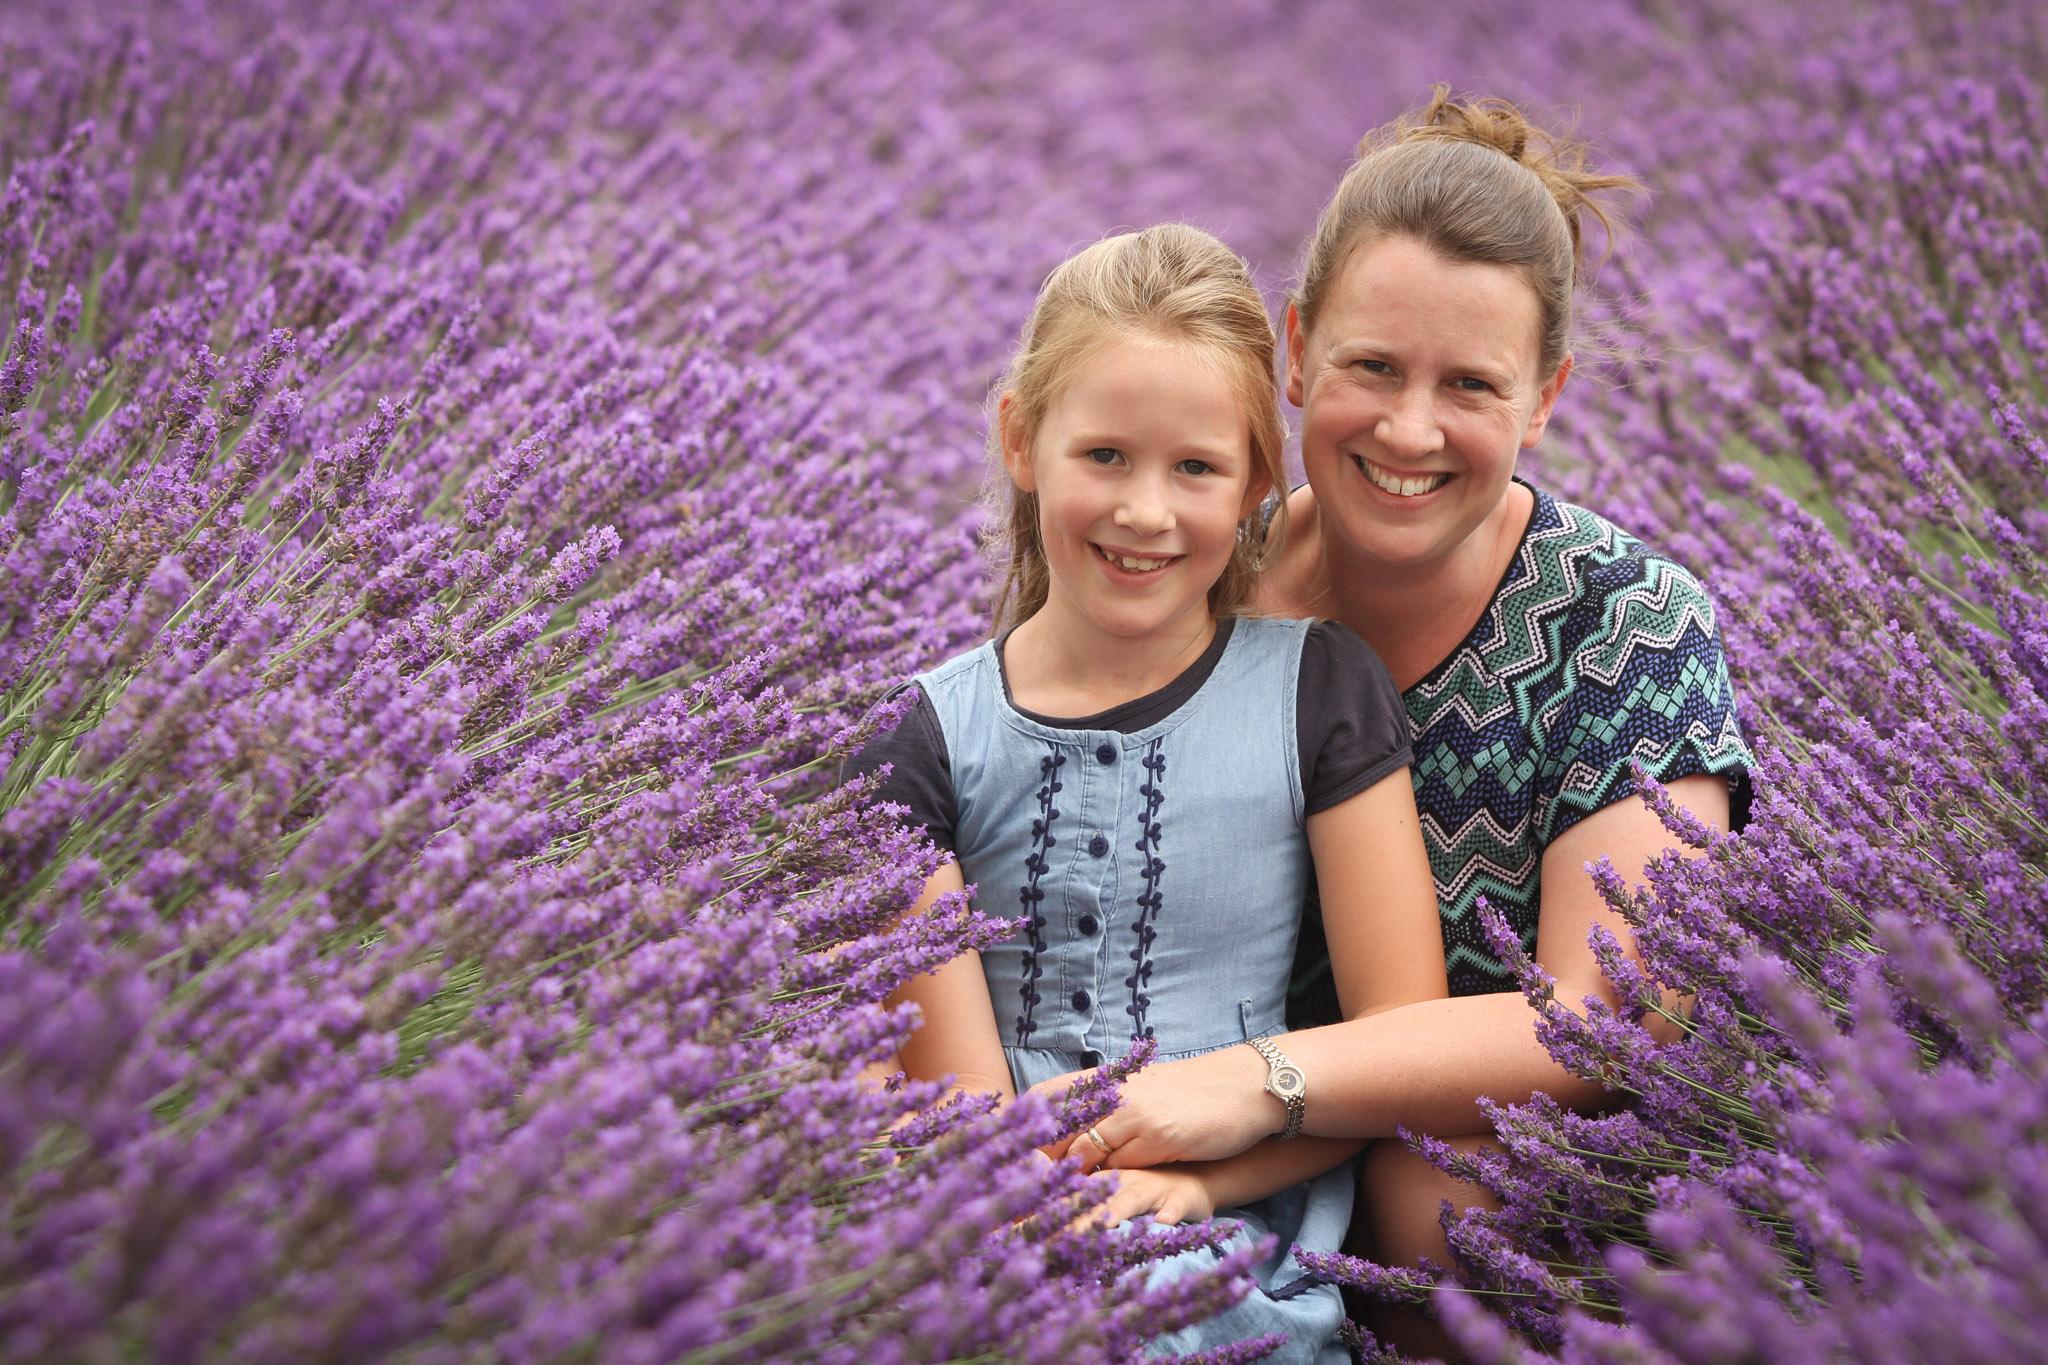 Lavender-fields-photo-shoot-mum-and-daughter.jpg